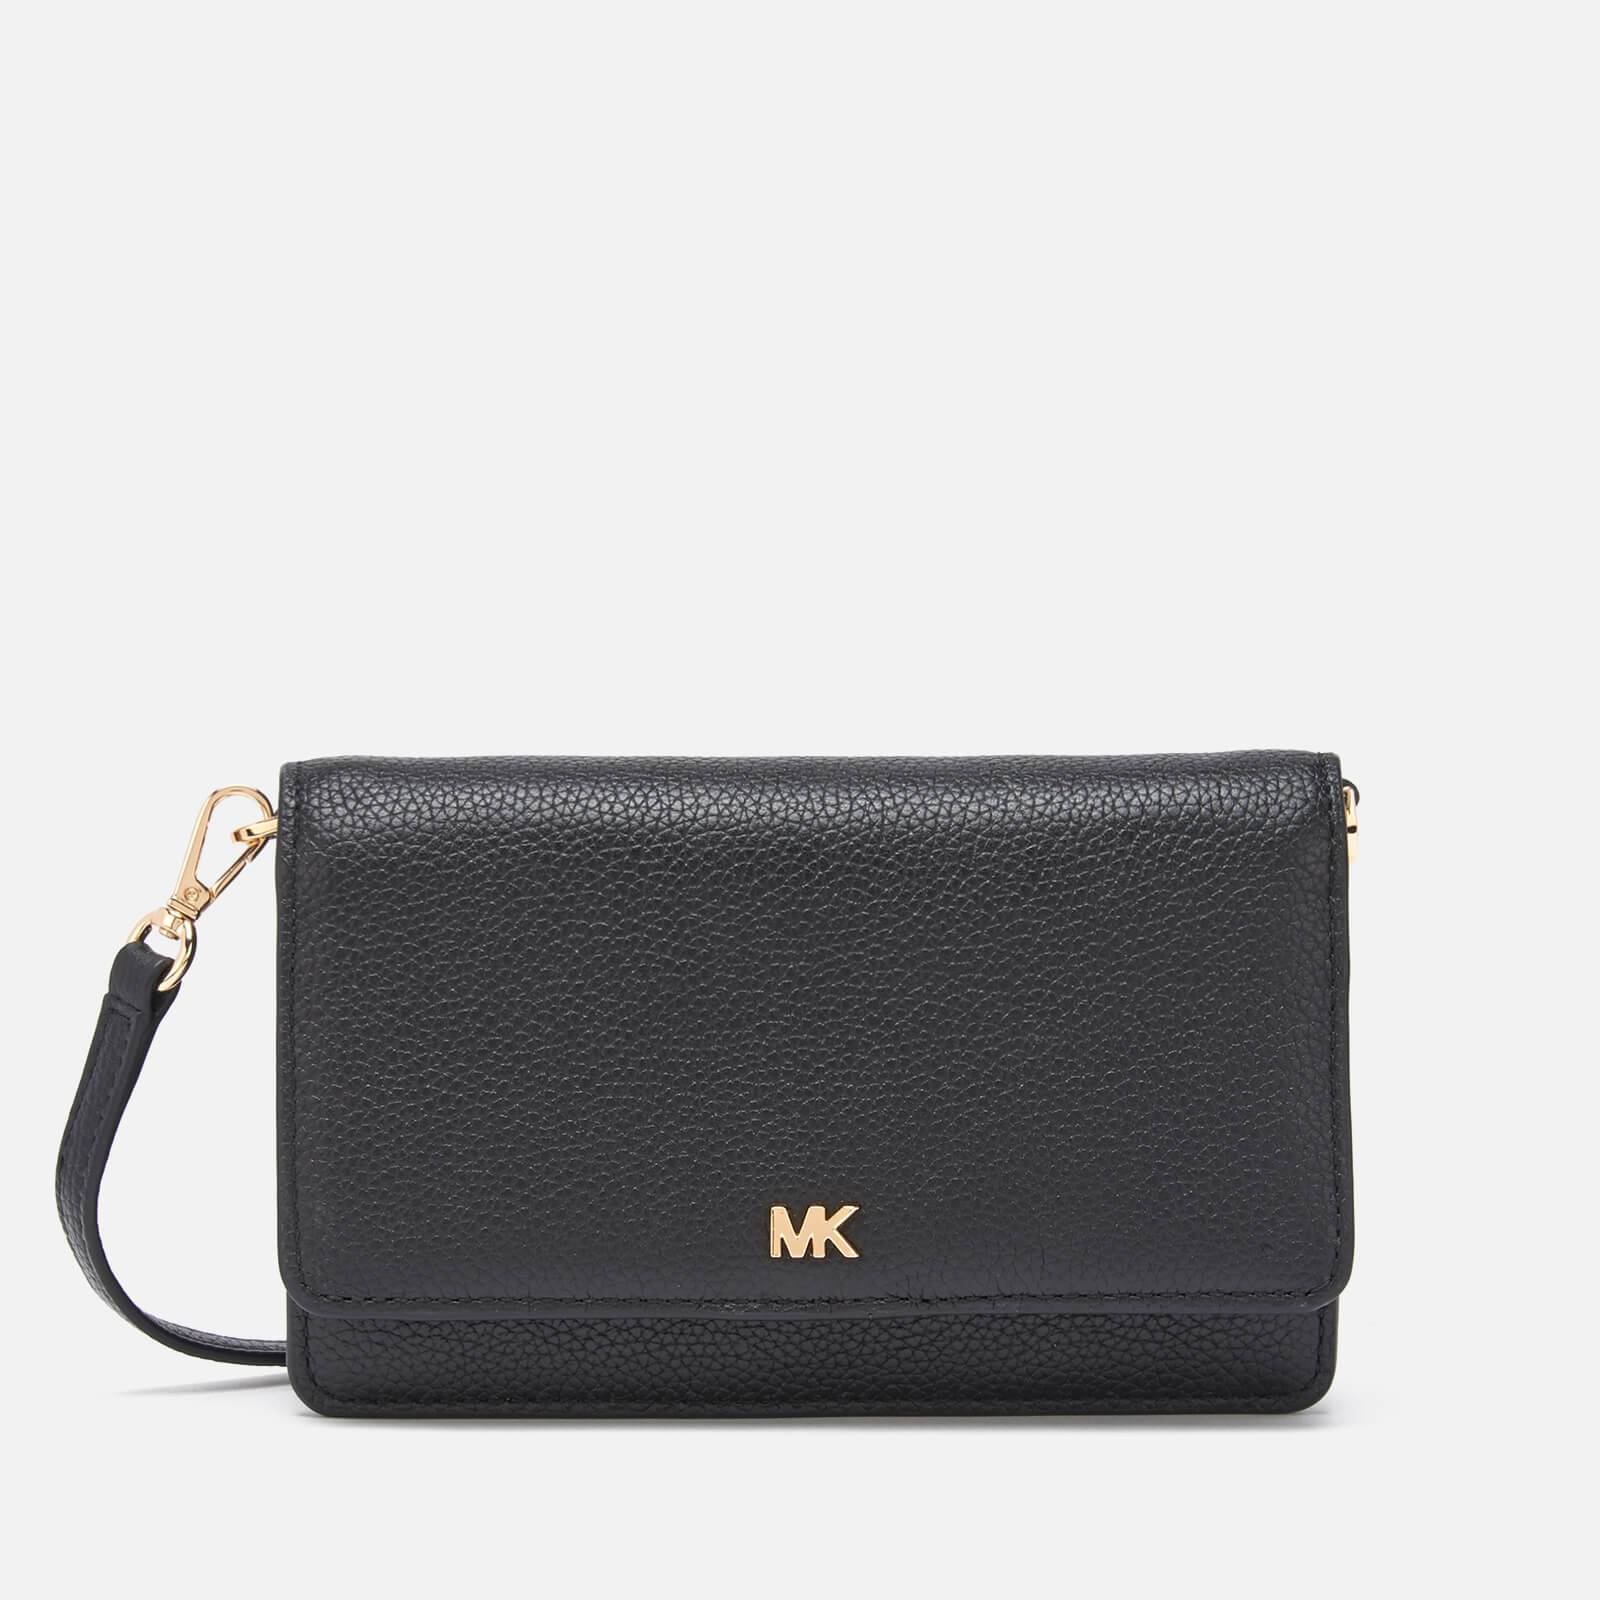 MICHAEL MICHAEL KORS Women's Crossbodies Phone Cross Body Bag - Black